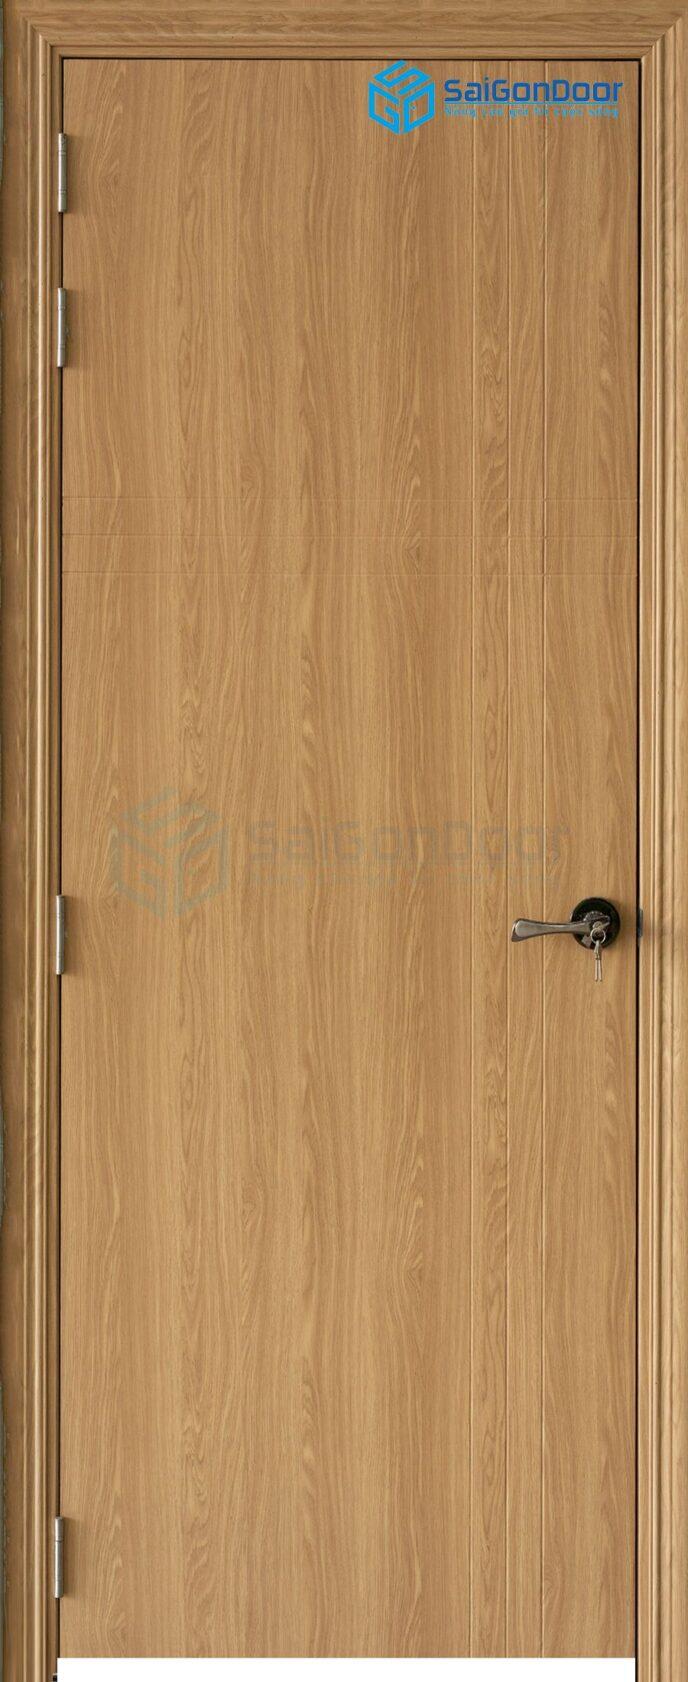 Cửa gỗ cao cấp Hàn Quốc 667